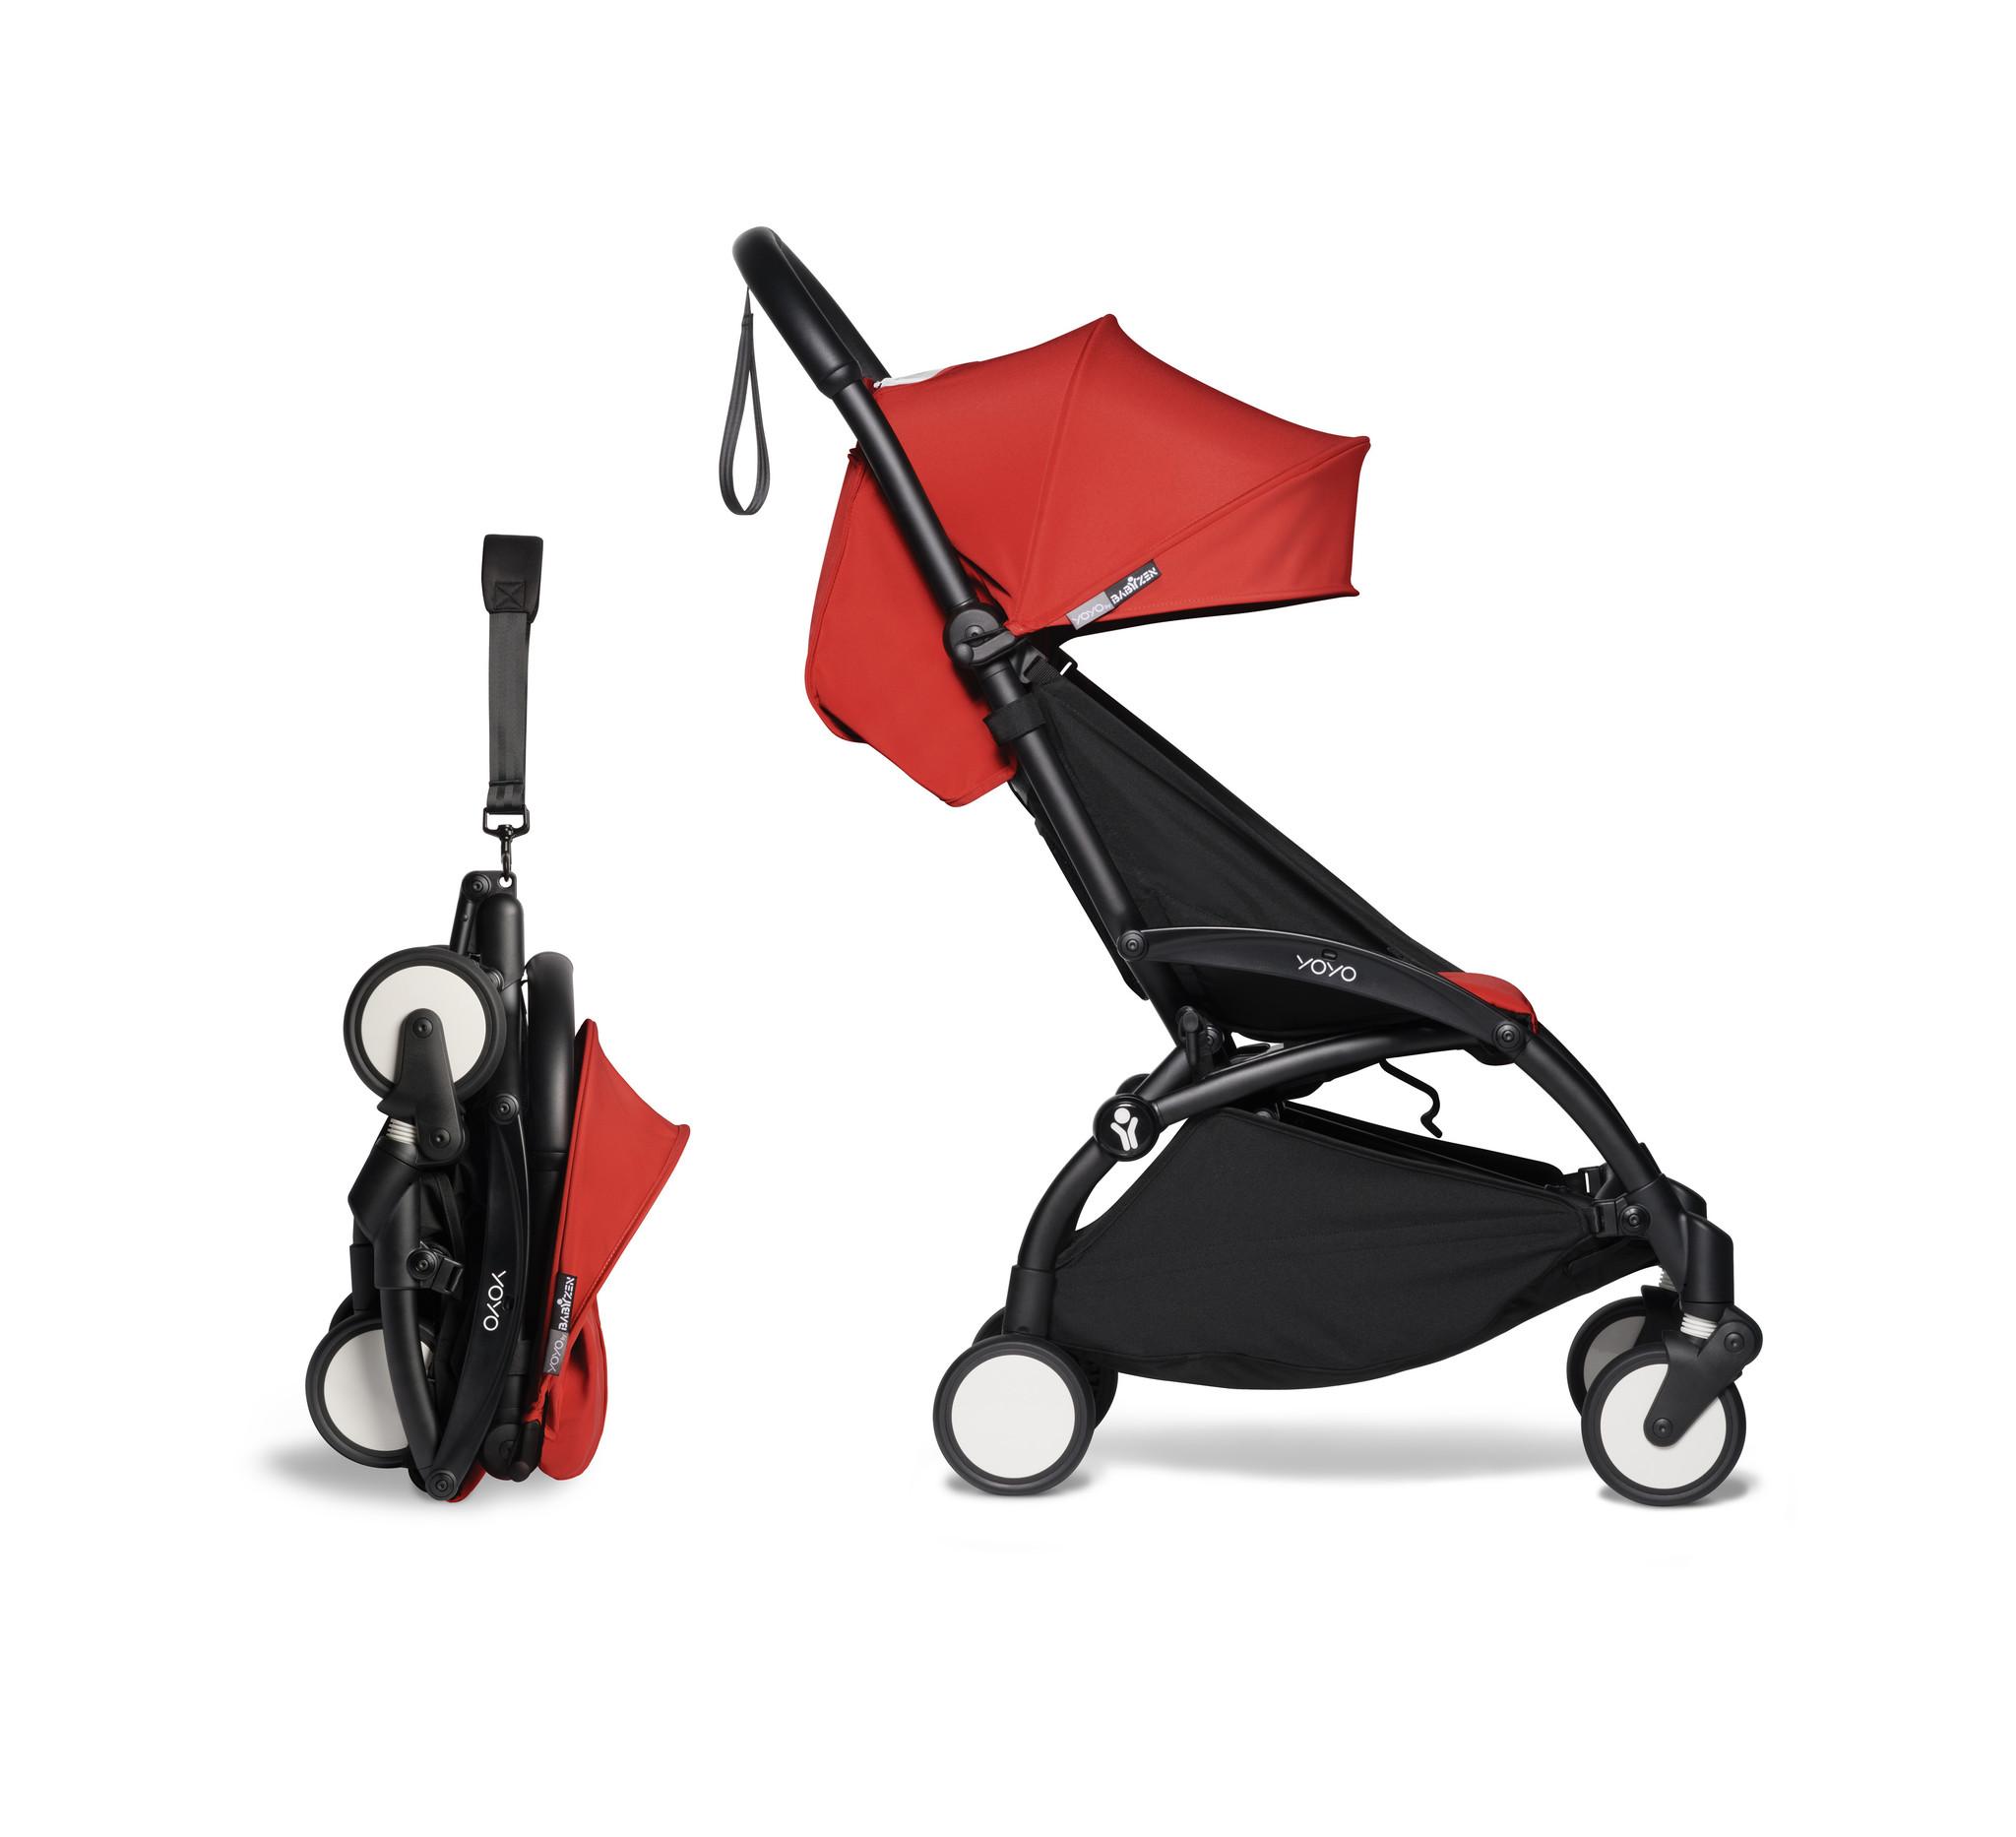 Babyzen Babyzen YOYO² Buggy 6+ roter Rahmen schwarz